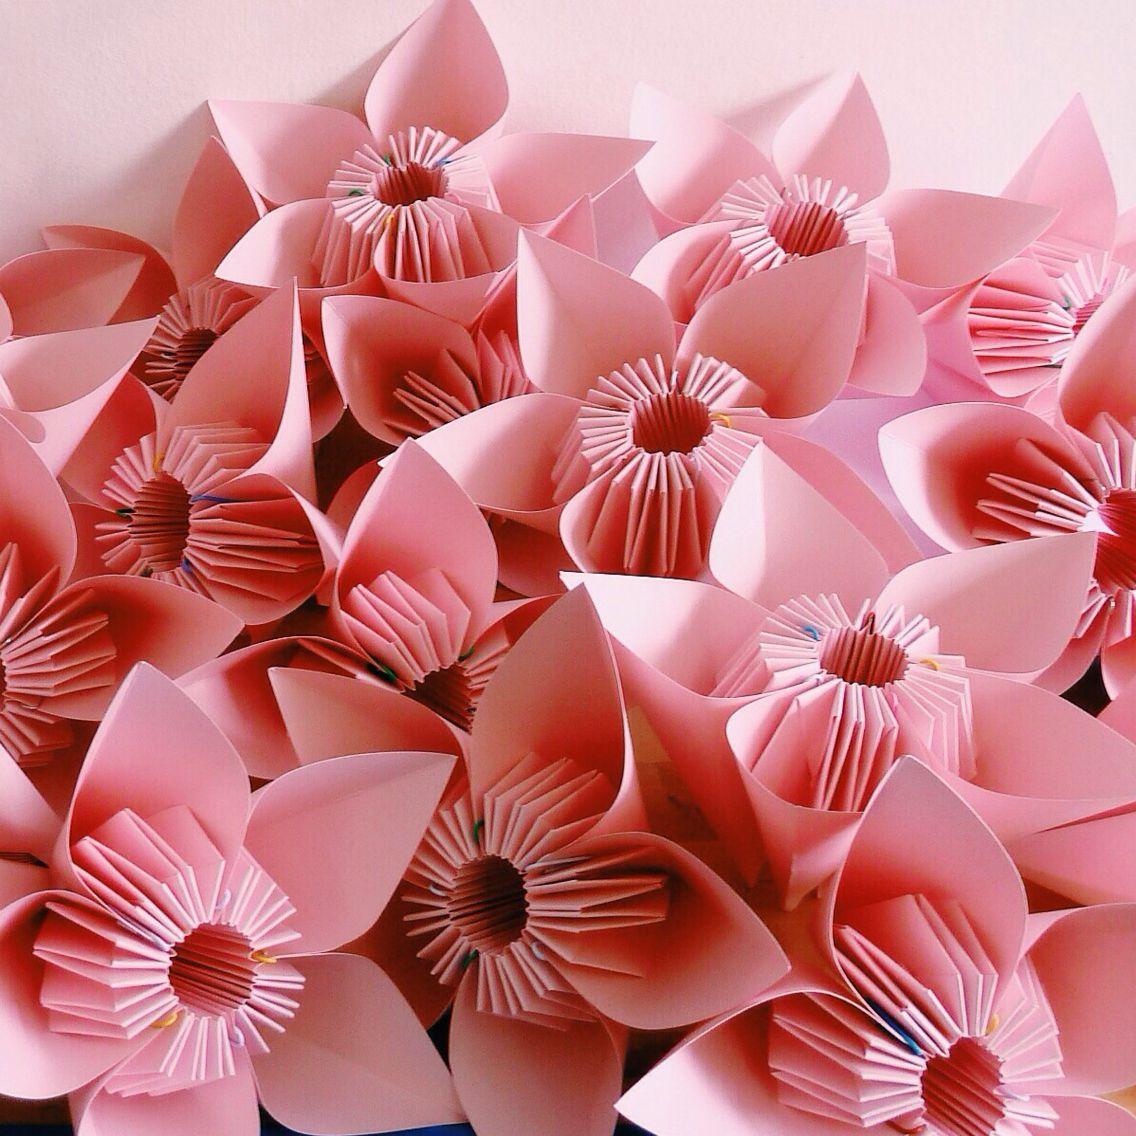 it's a heart heart season: Origami Cherry Blossoms   1136x1136